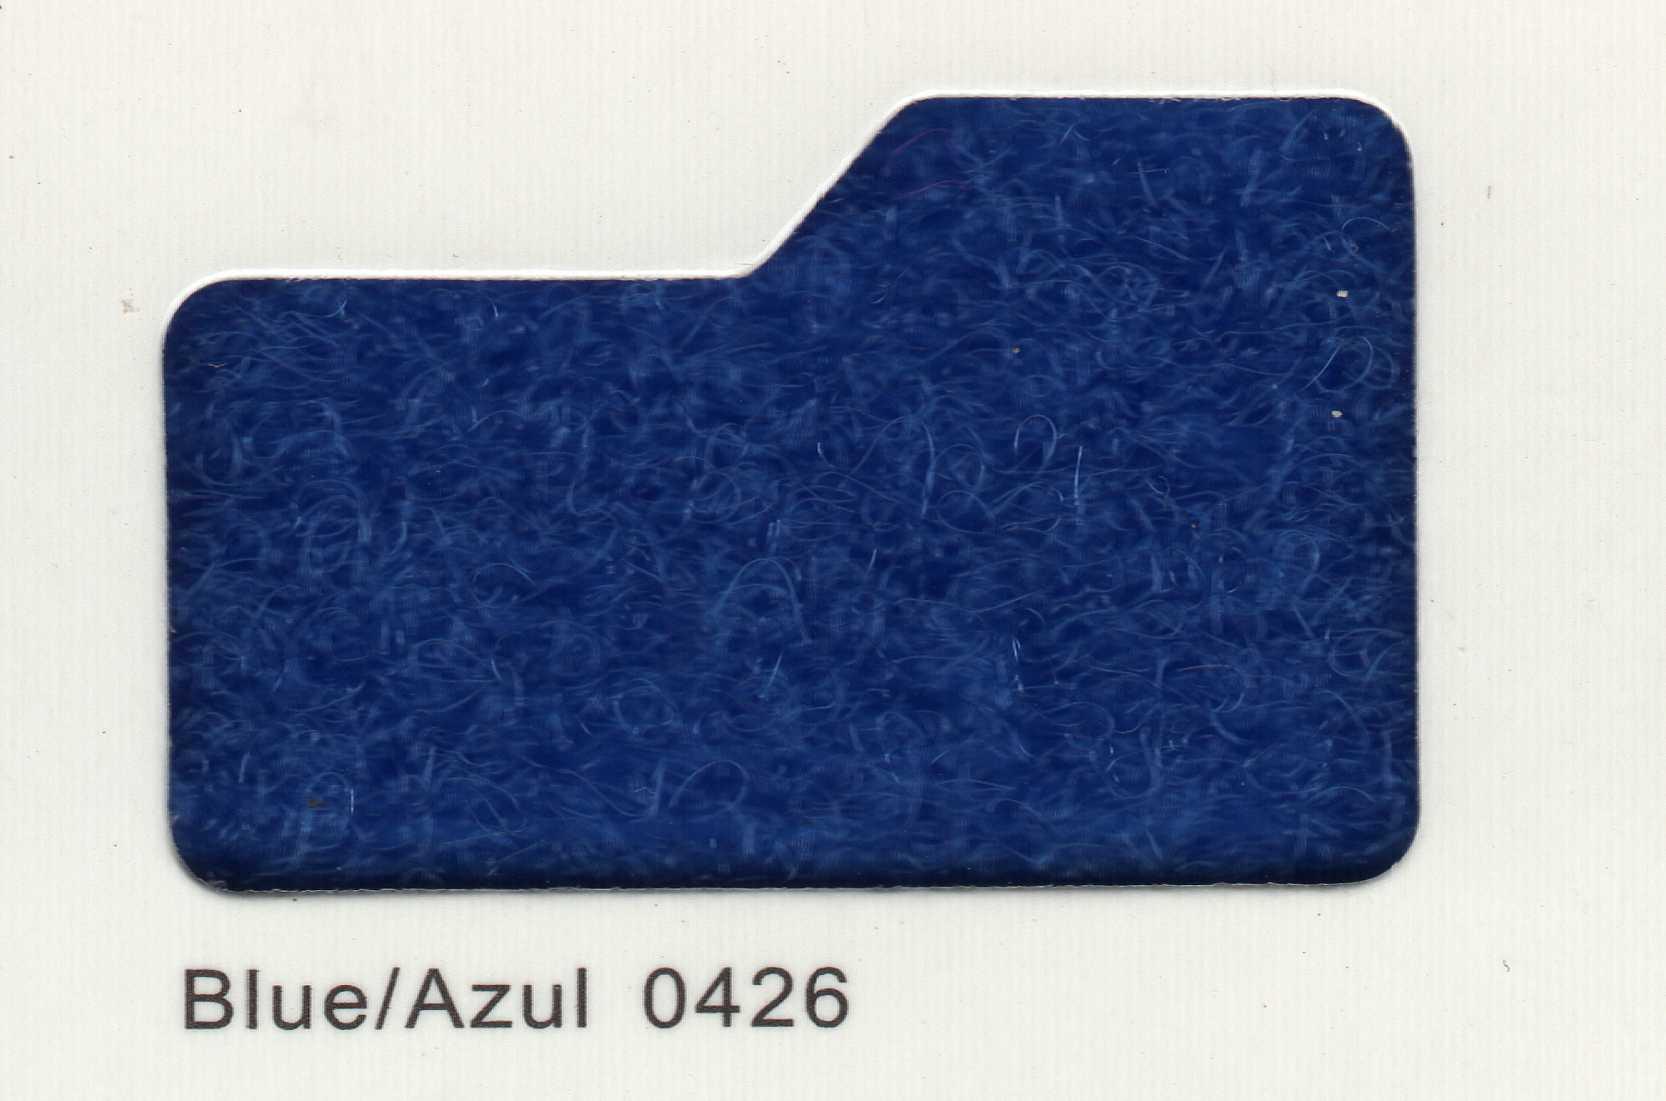 Cinta de cierre Velcro-Veraco 20mm Azul 0426 (Gancho). : Catálogo de Mercería Barcelona